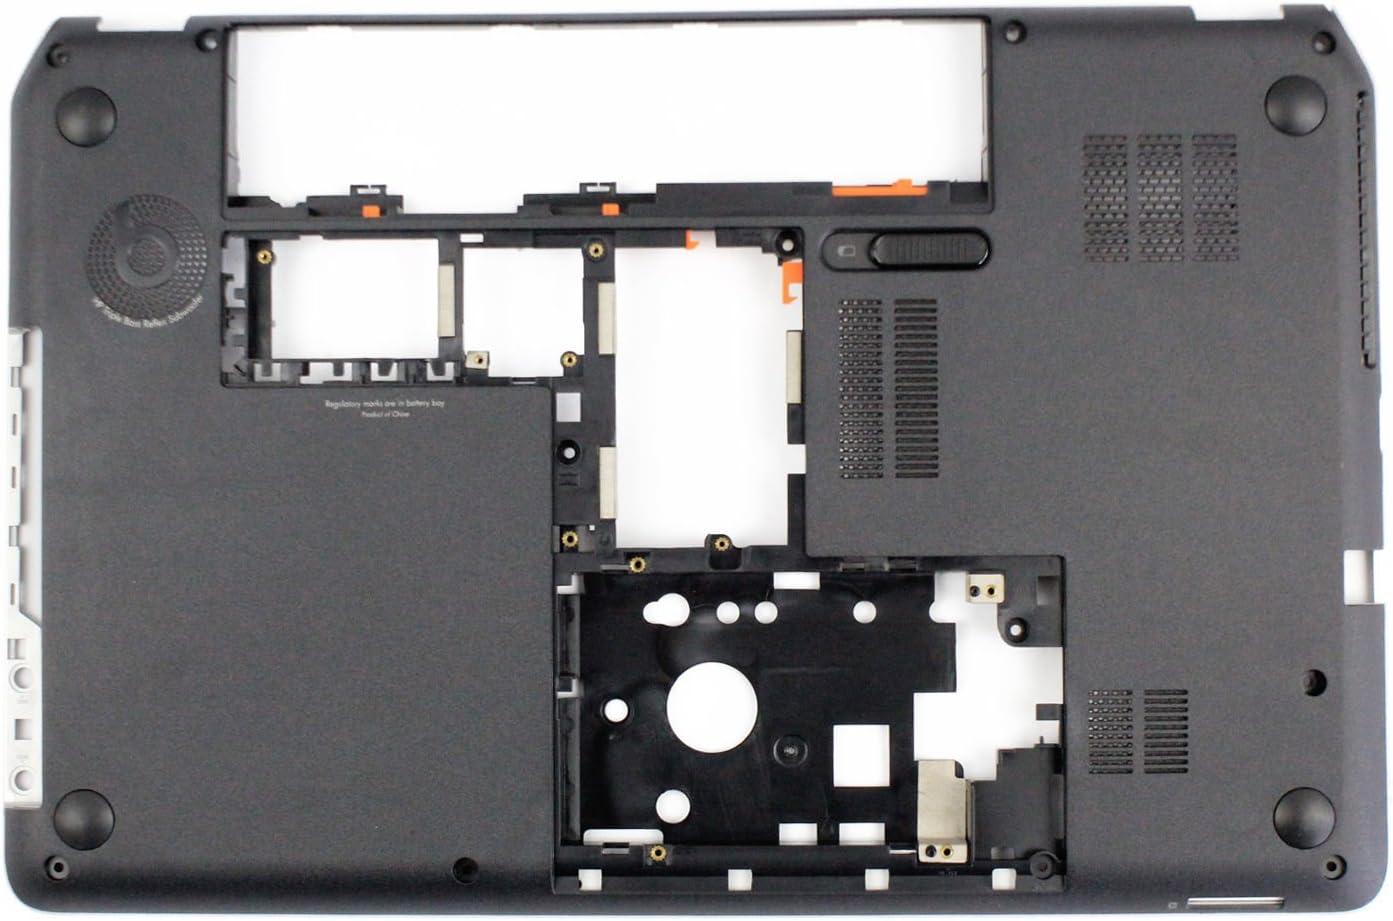 Ivos Replacement Laptop BLACK Bottom Case Midframe Lower Base Cover Enclosure Chassis for HP Pavilion Envy M6 M6-1000 M6-1125dx M6-1035dx M6-1009DX 707886-001 686896-001